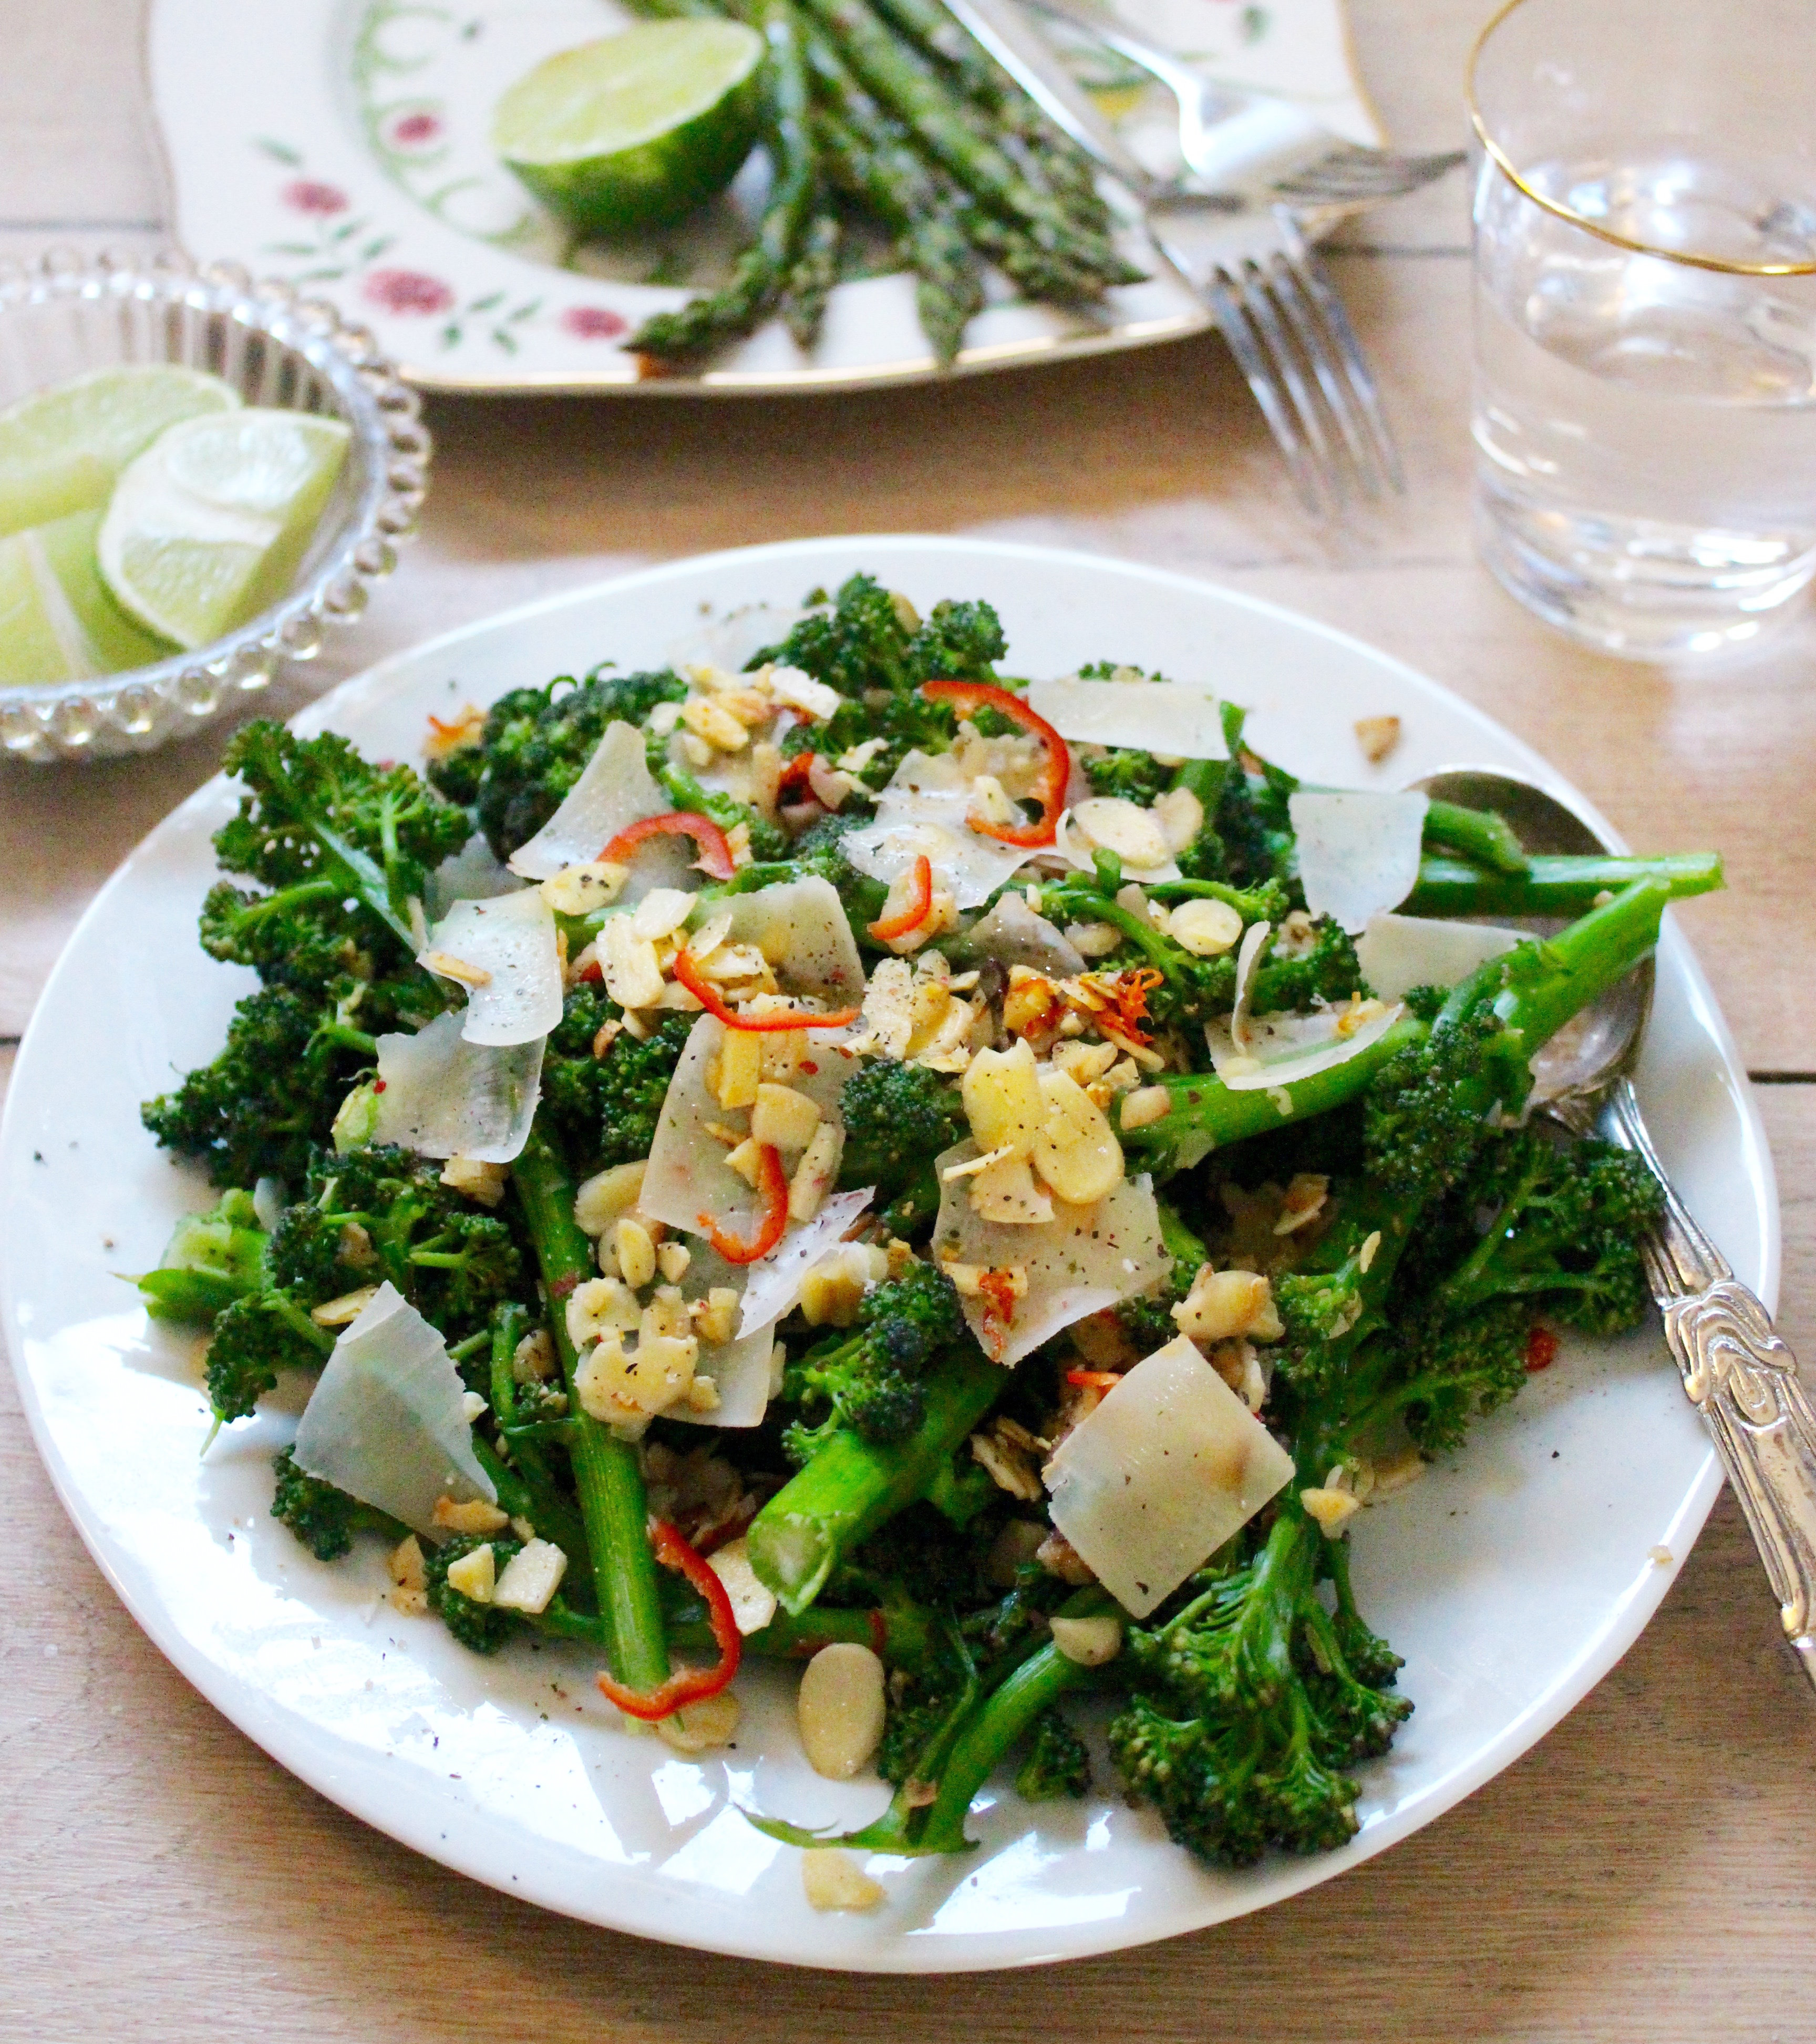 Broccoli Chili & Almonds1